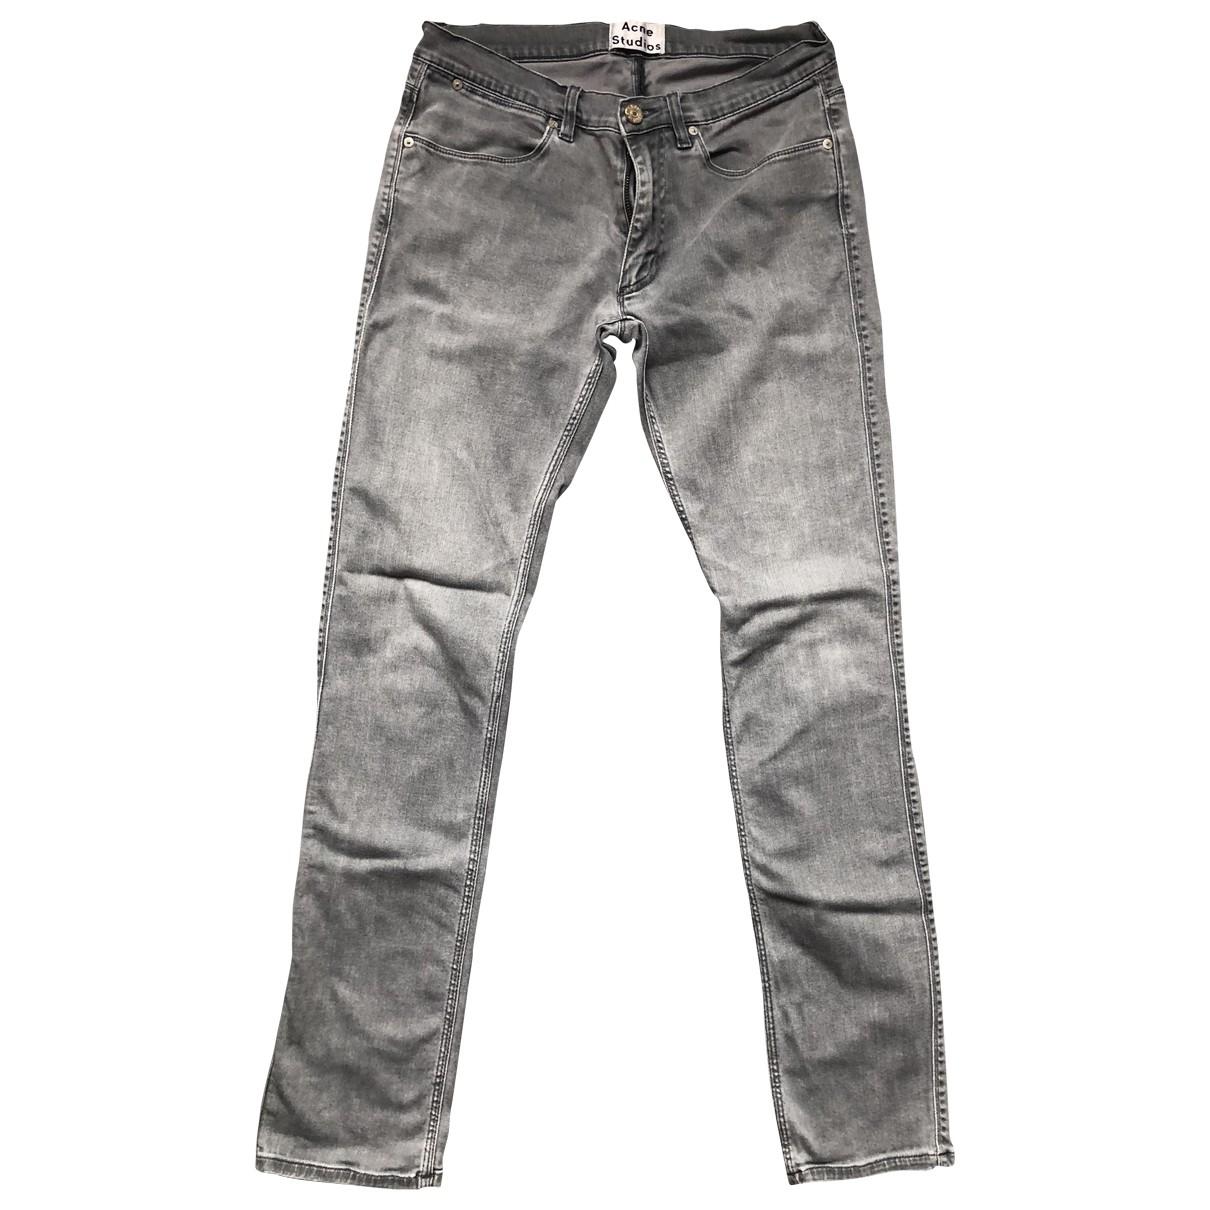 Acne Studios \N Grey Cotton Jeans for Men 38 FR